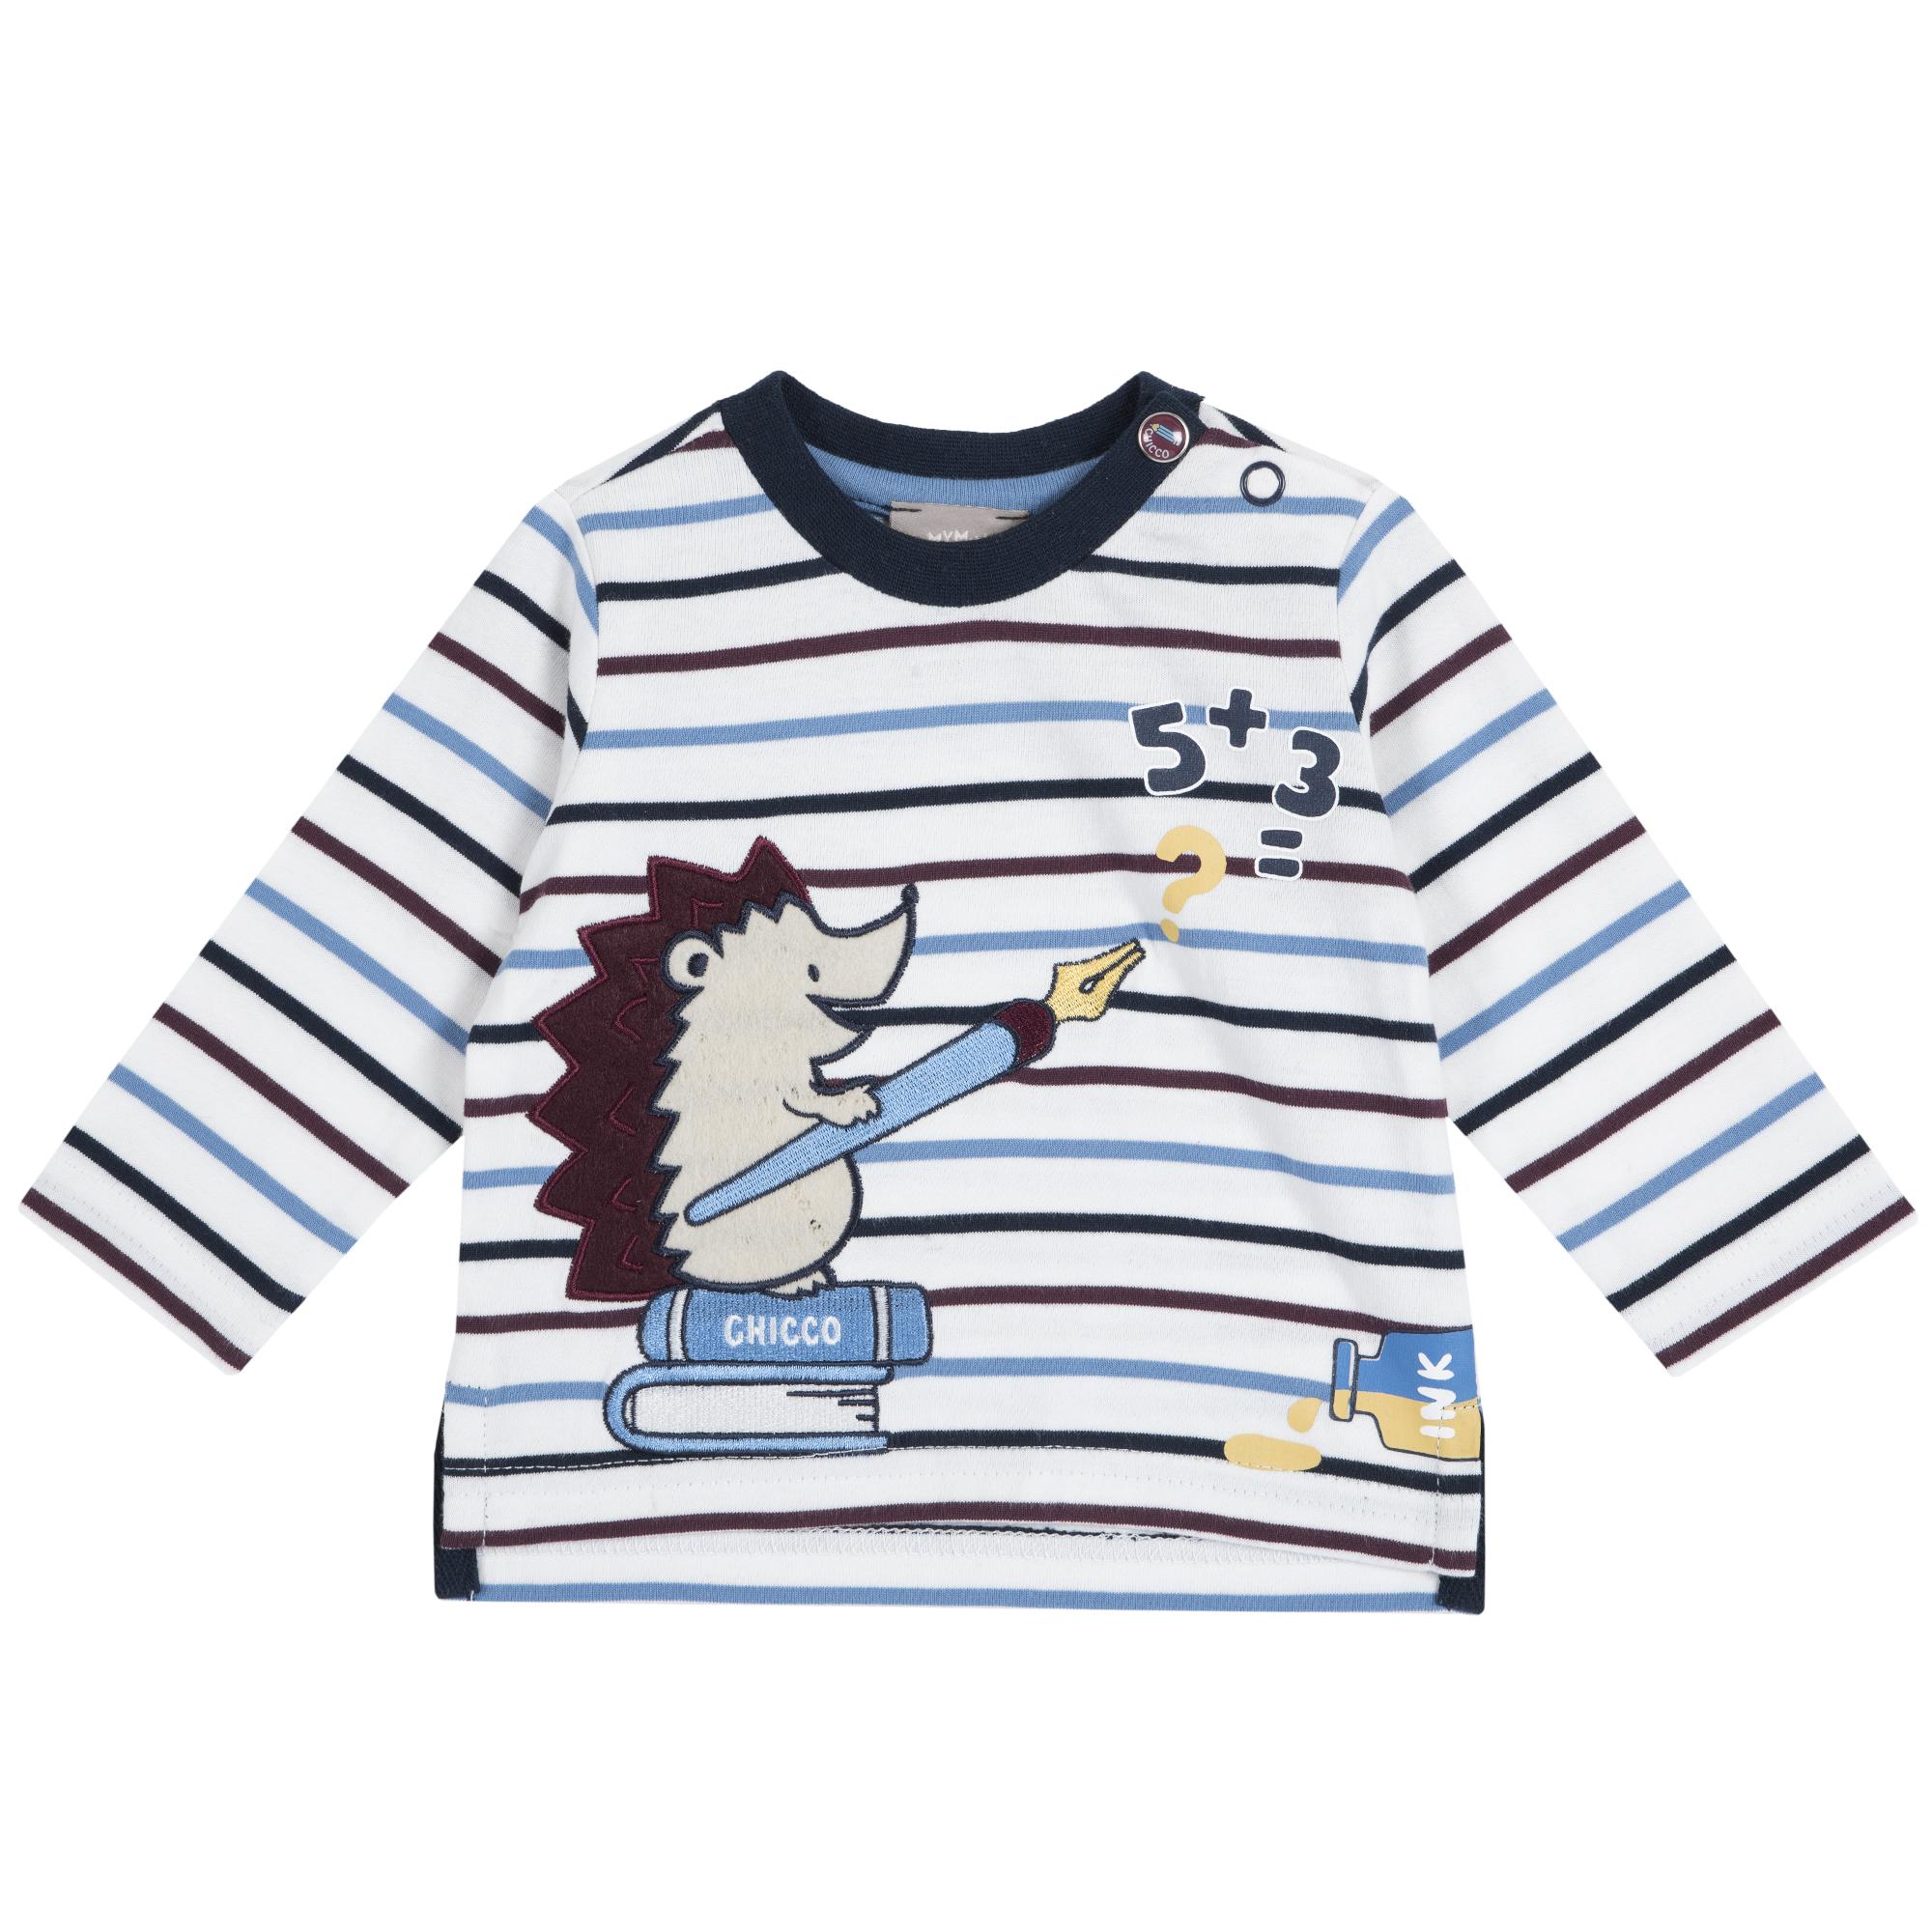 Tricou copii Chicco, maneca lunga, imprimeu ariciul matematician, 06765 din categoria Tricouri copii